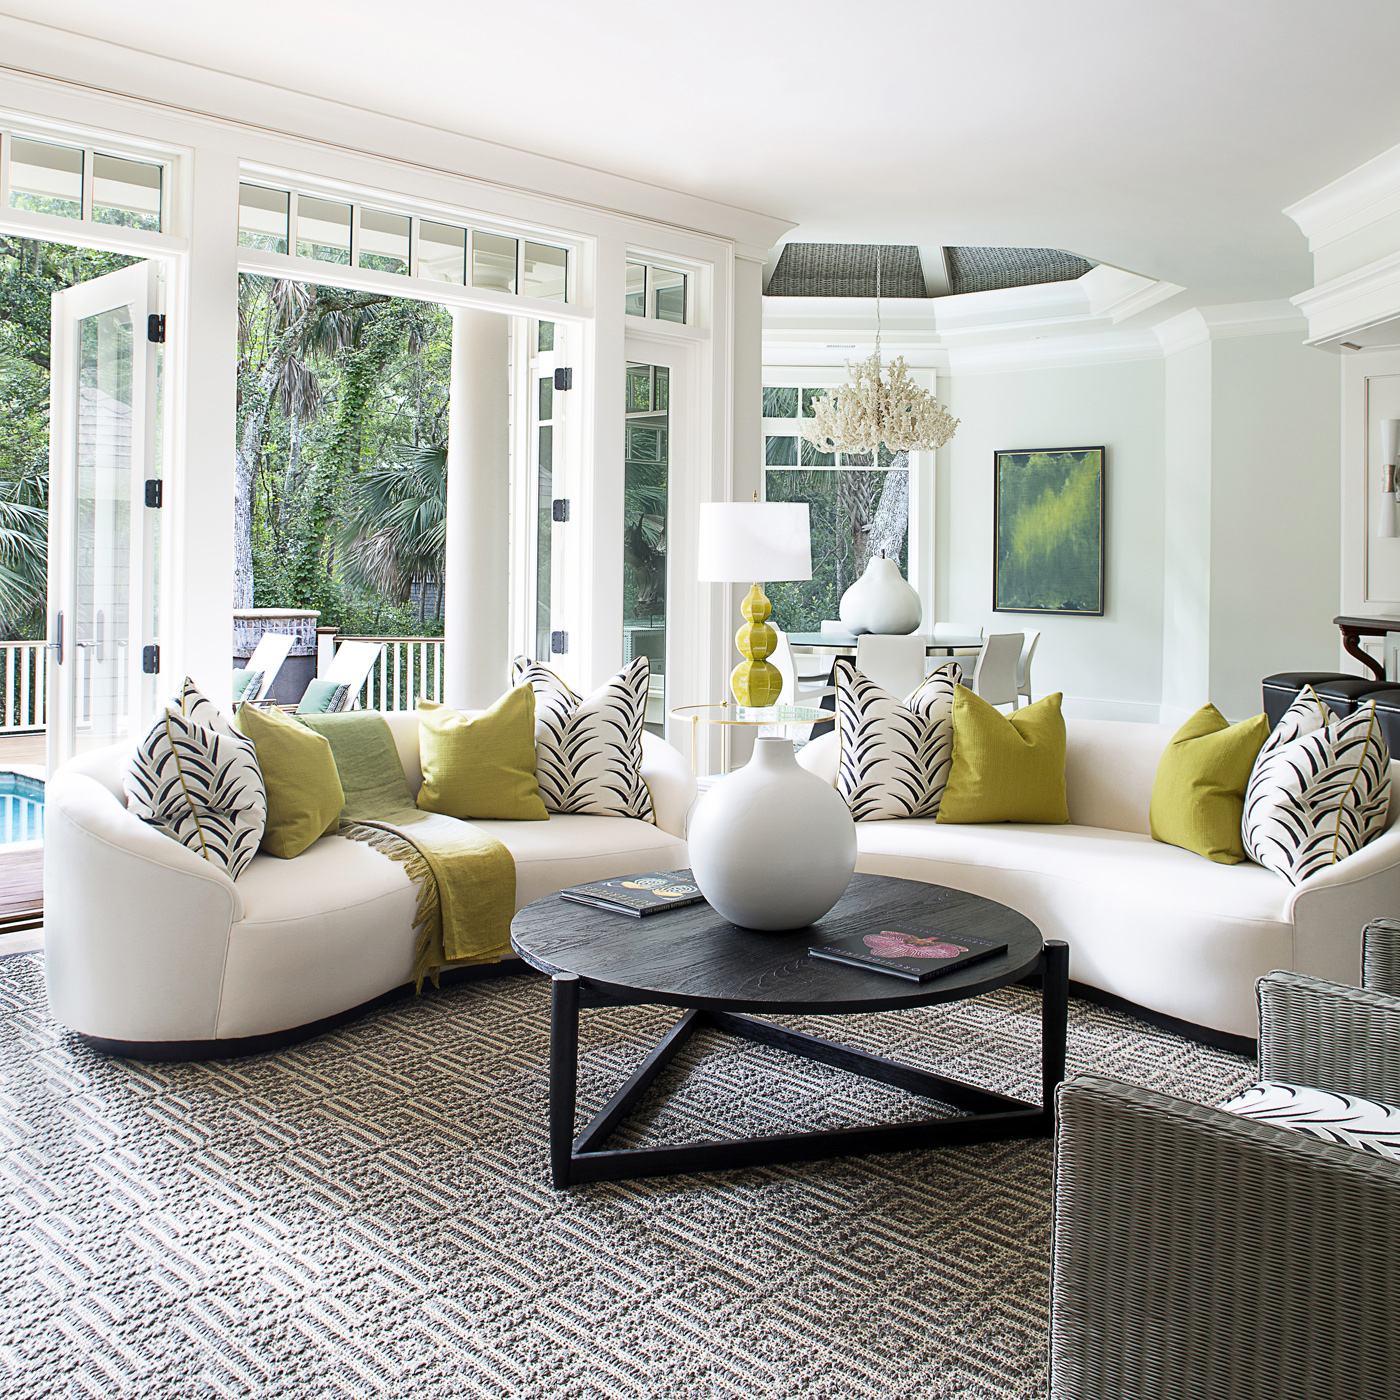 Living room overlooking tropical landscape with pool; Vladimir Kagan kidney shaped sofas | Savage Interior Design